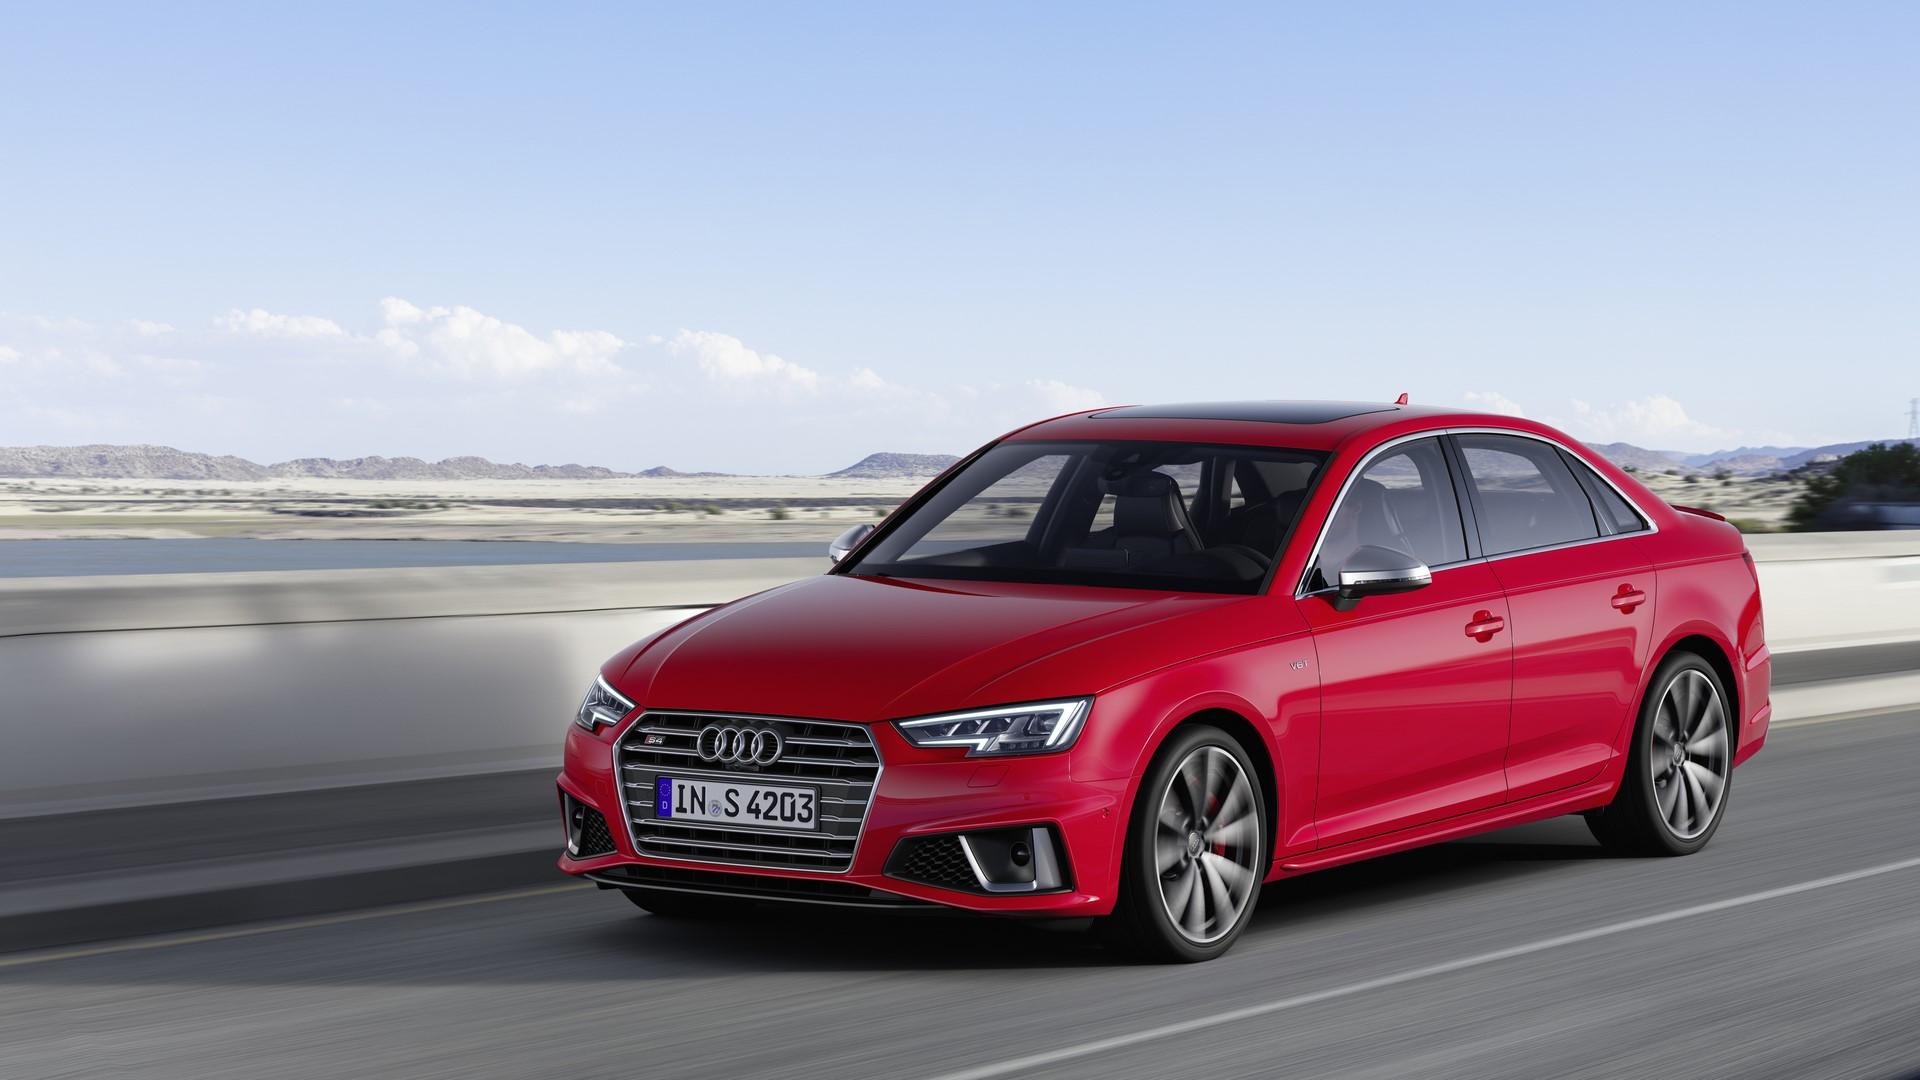 Audi S4 Sedan TDI